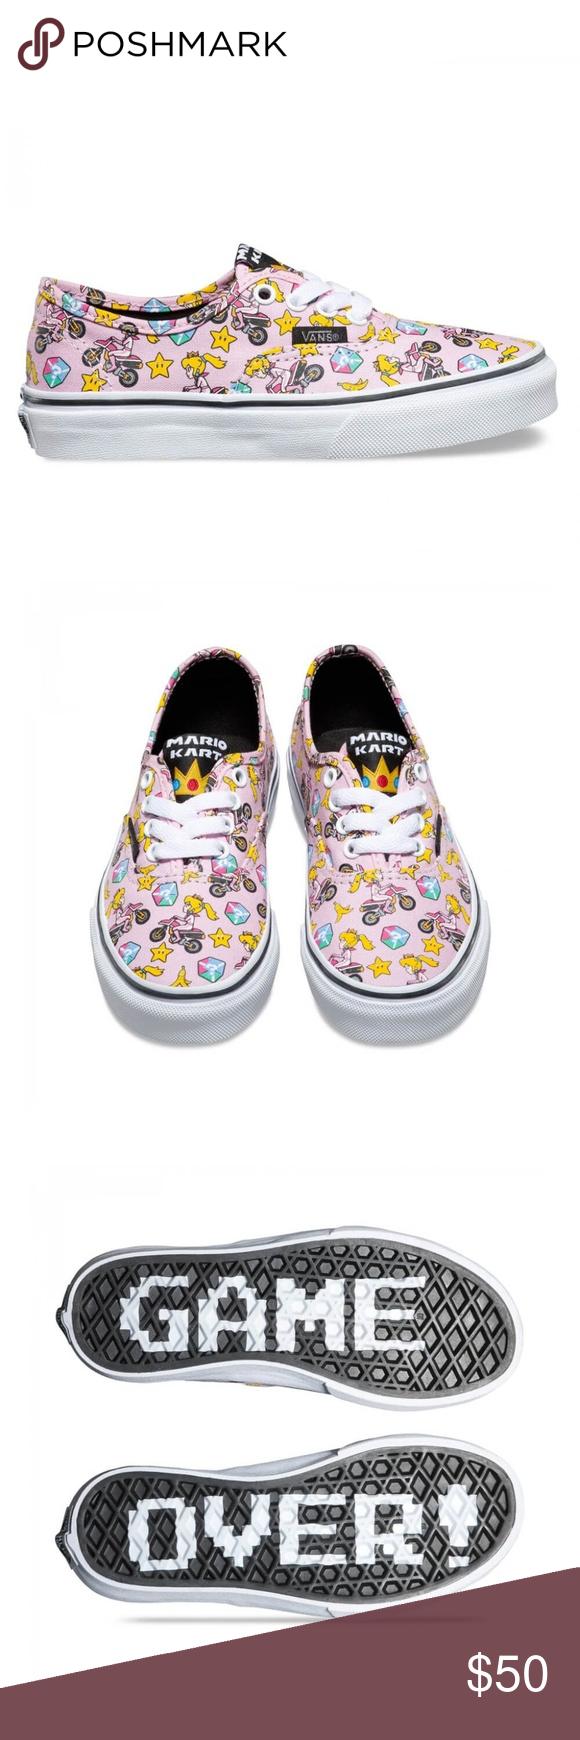 741626c0cd2890 NIB Vans Mario Bros. Princess Peach Shoes Size 8t Vans presents exclusive  graphic prints using